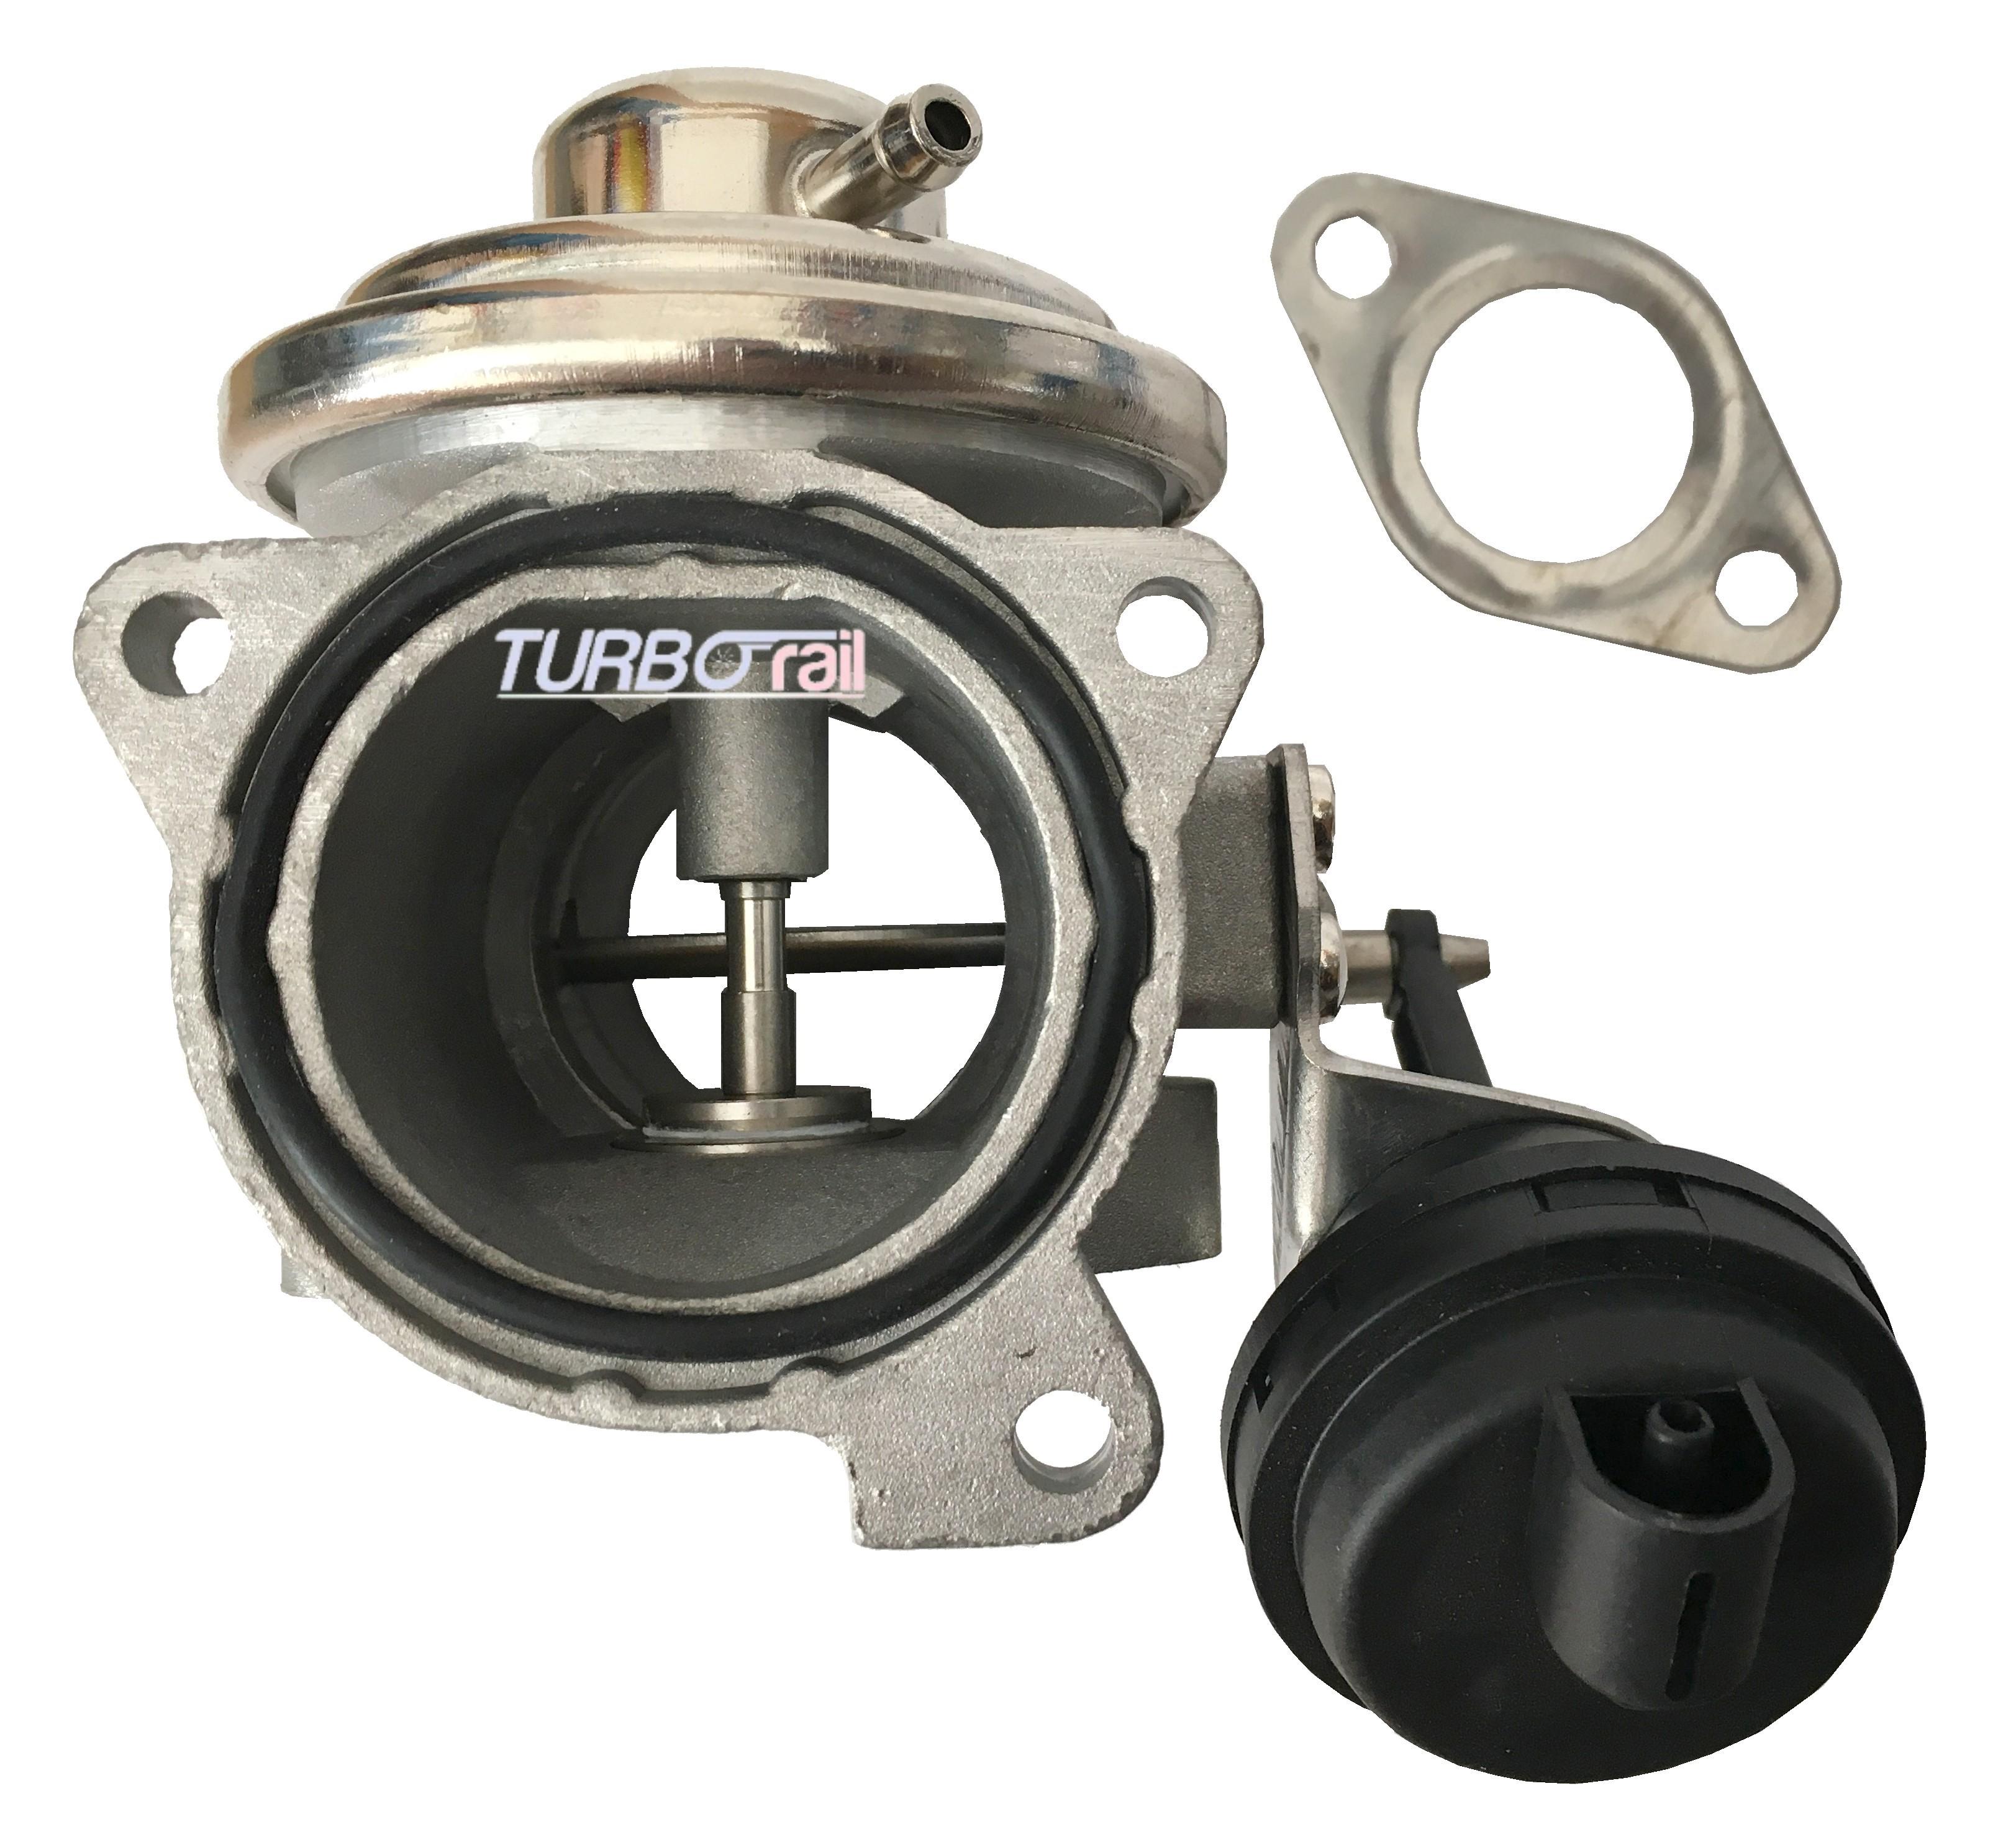 EGR ventil - TR00624 VW T5 1.9TDi 2.5TDi EGR/AGR ventily prémiové kvality